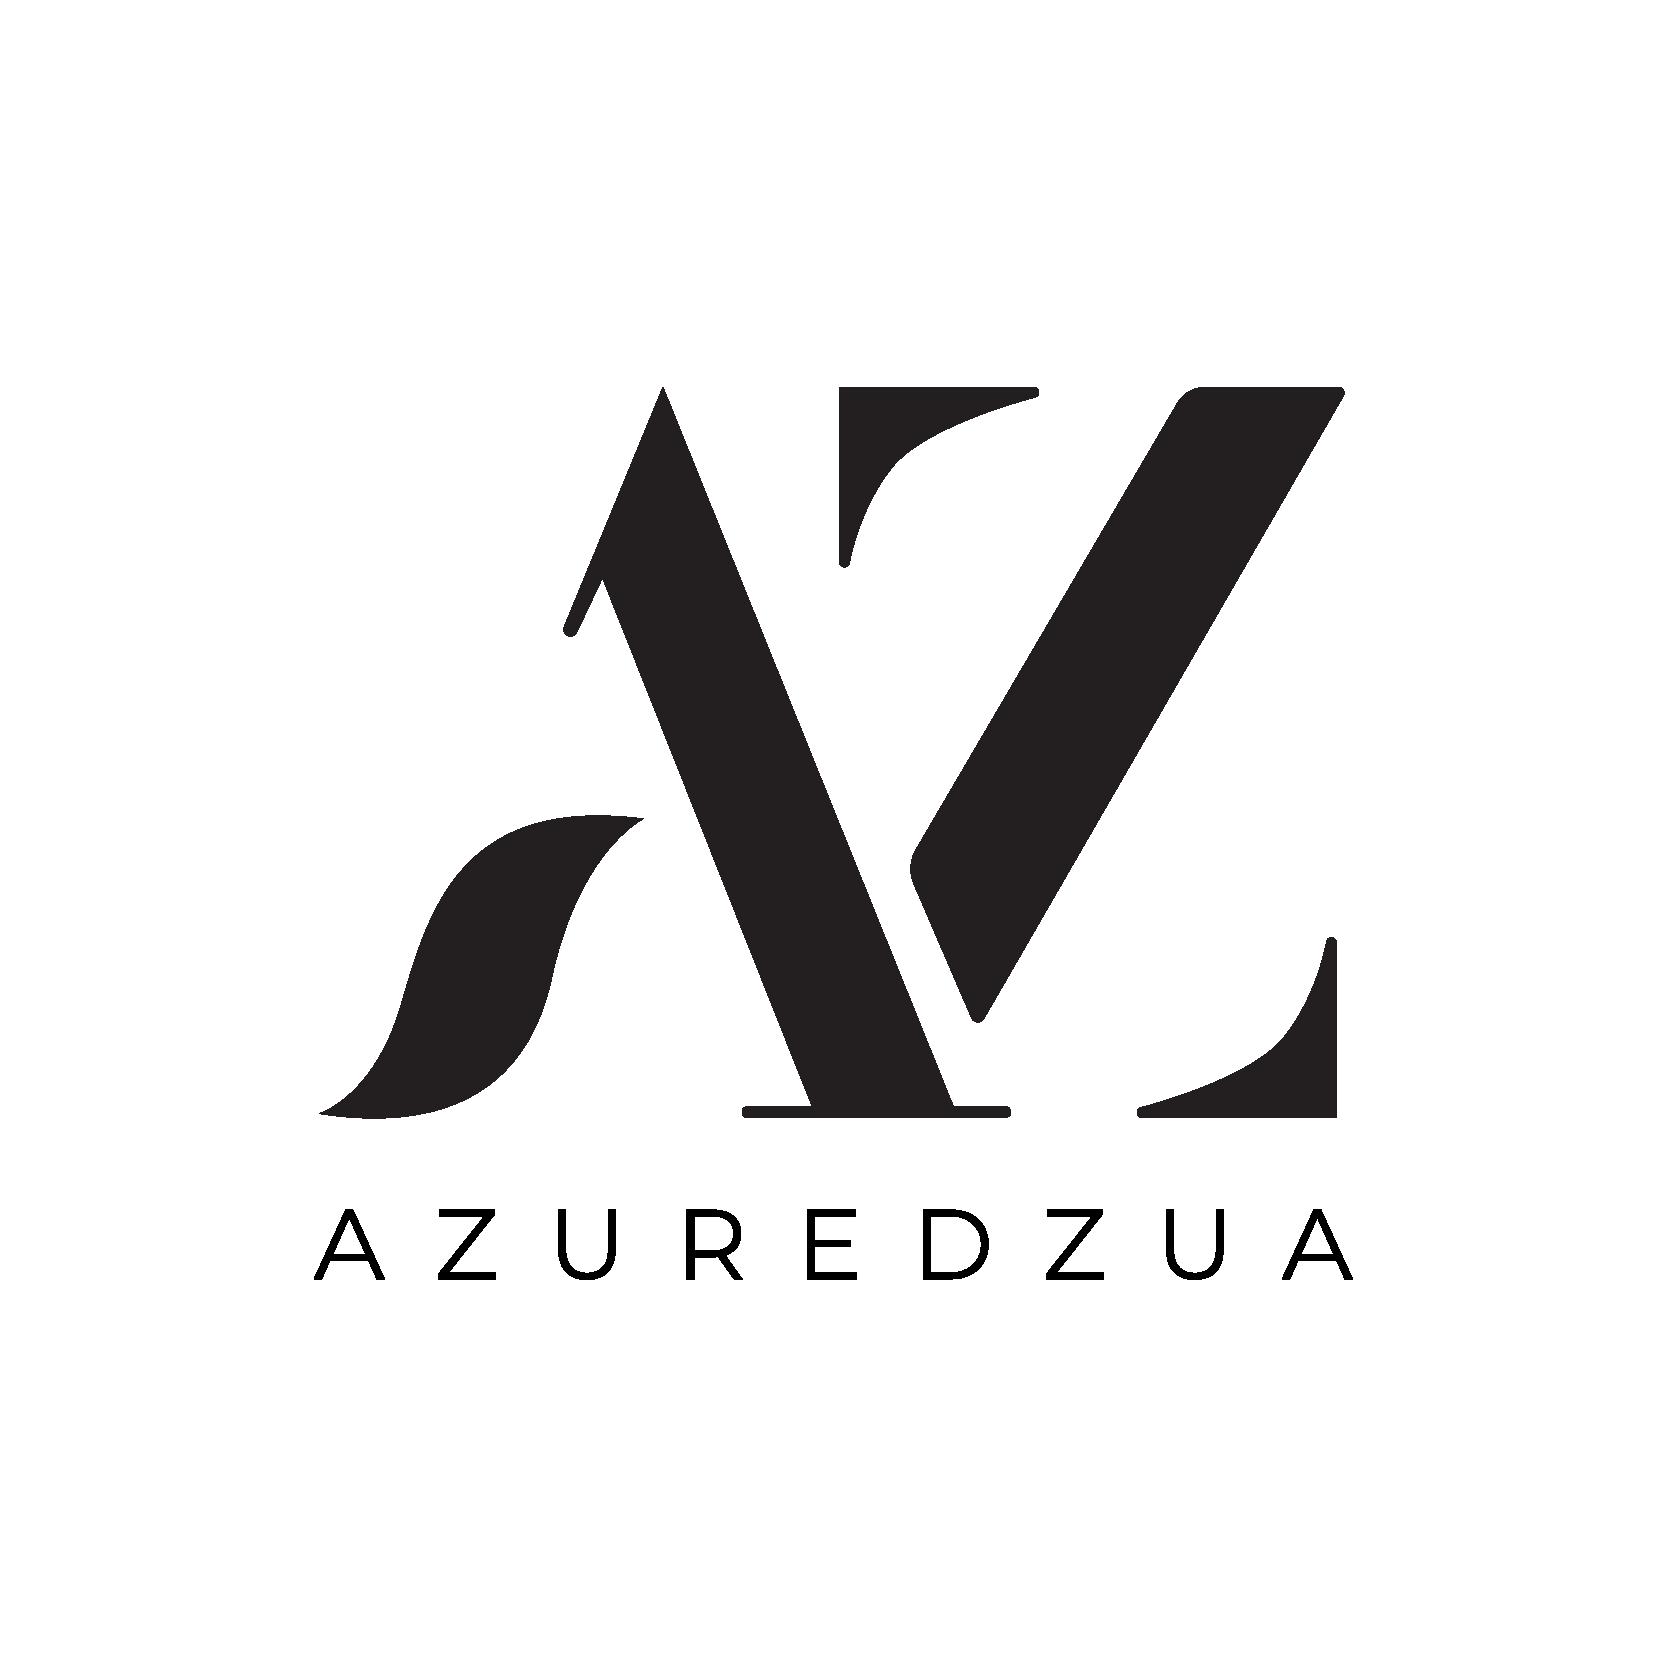 AZUREDZUA - Baju Kurung Moden Exclusive and Baju Raya 2021